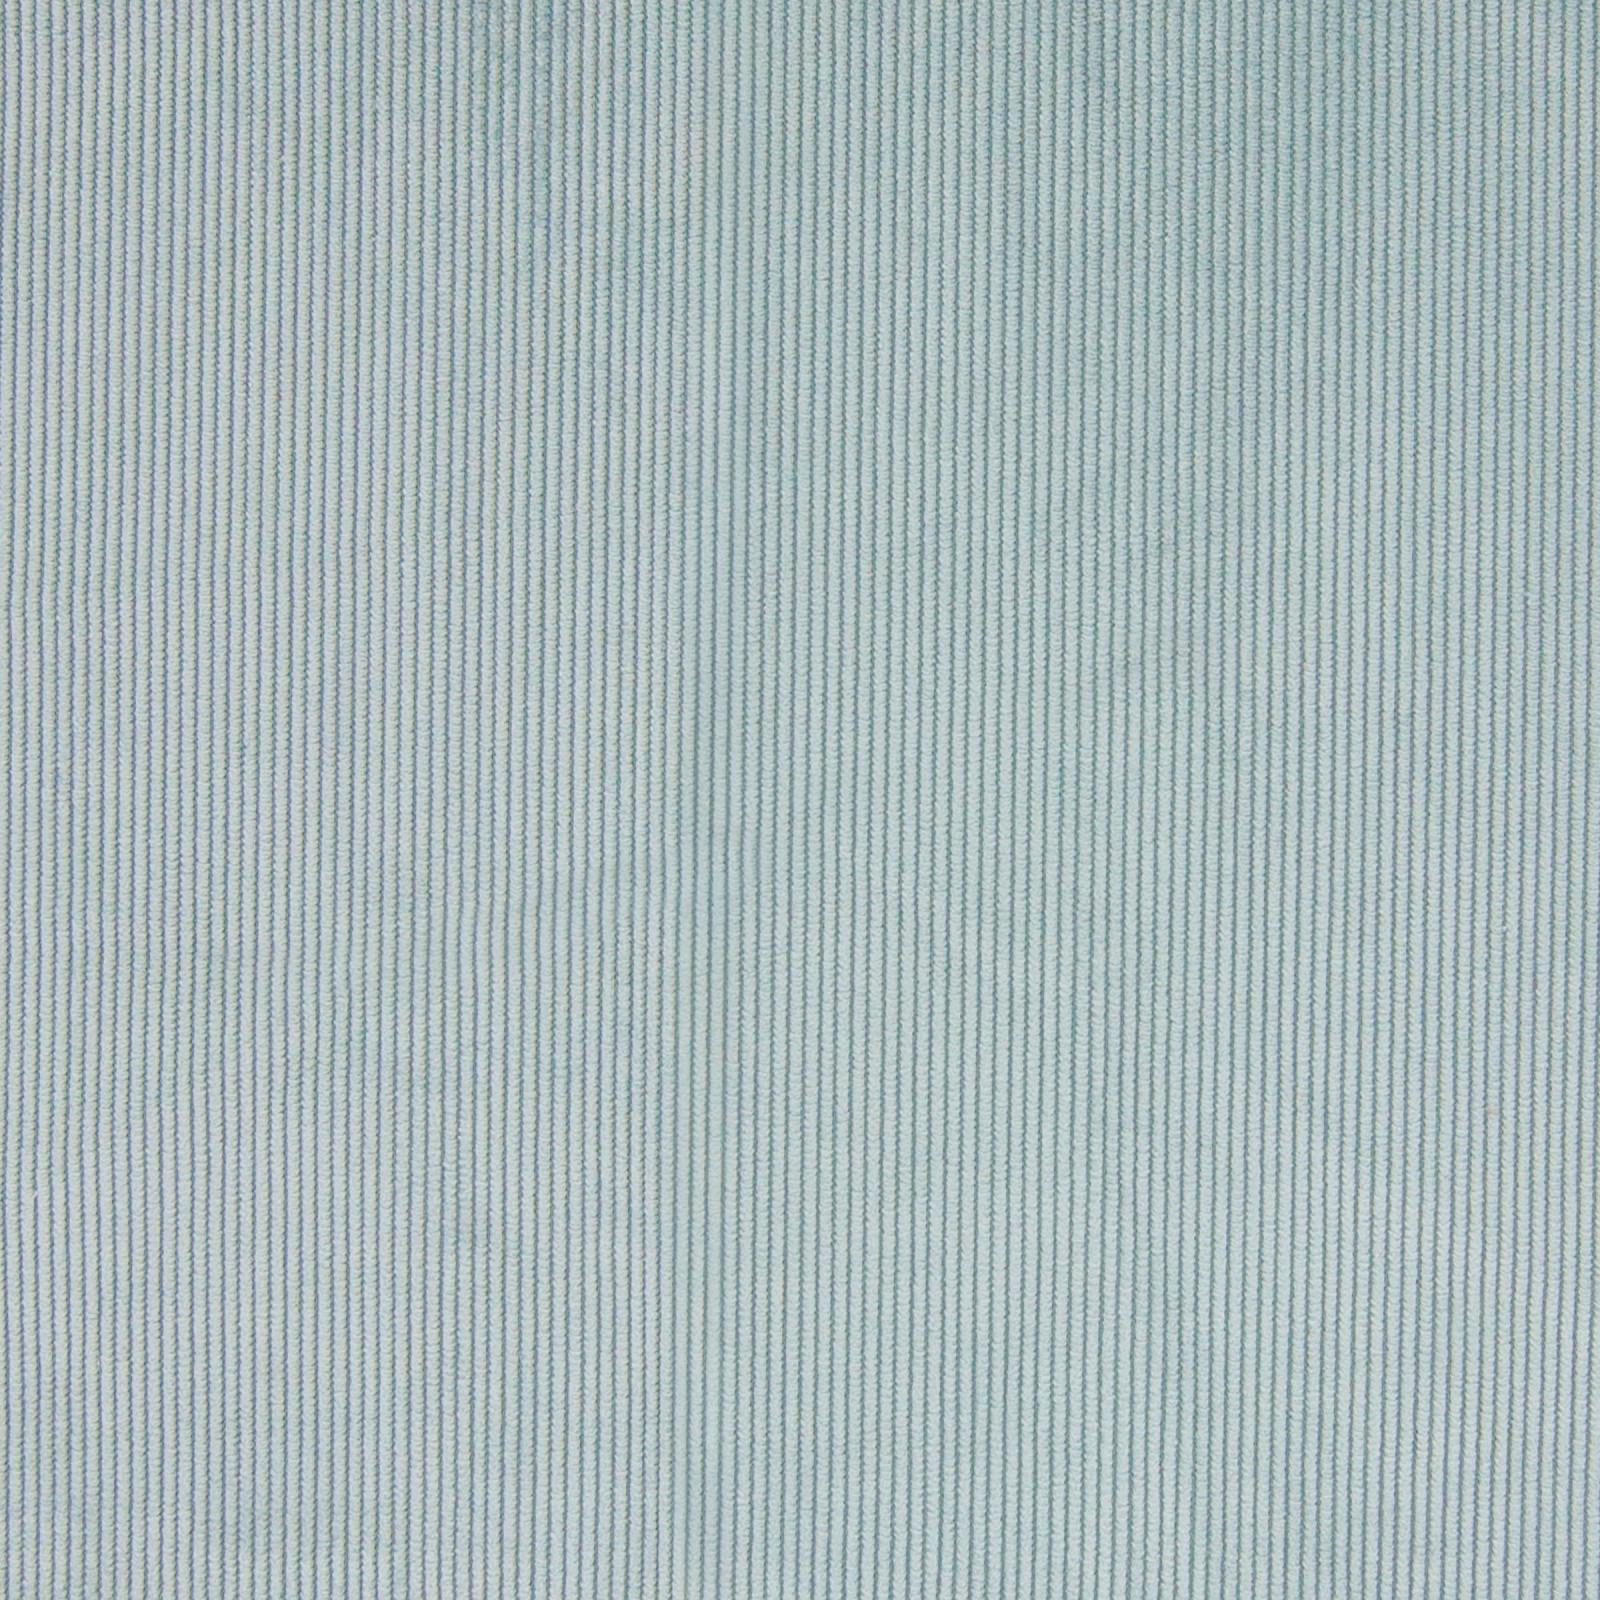 B7587 Ice | Greenhouse Fabrics